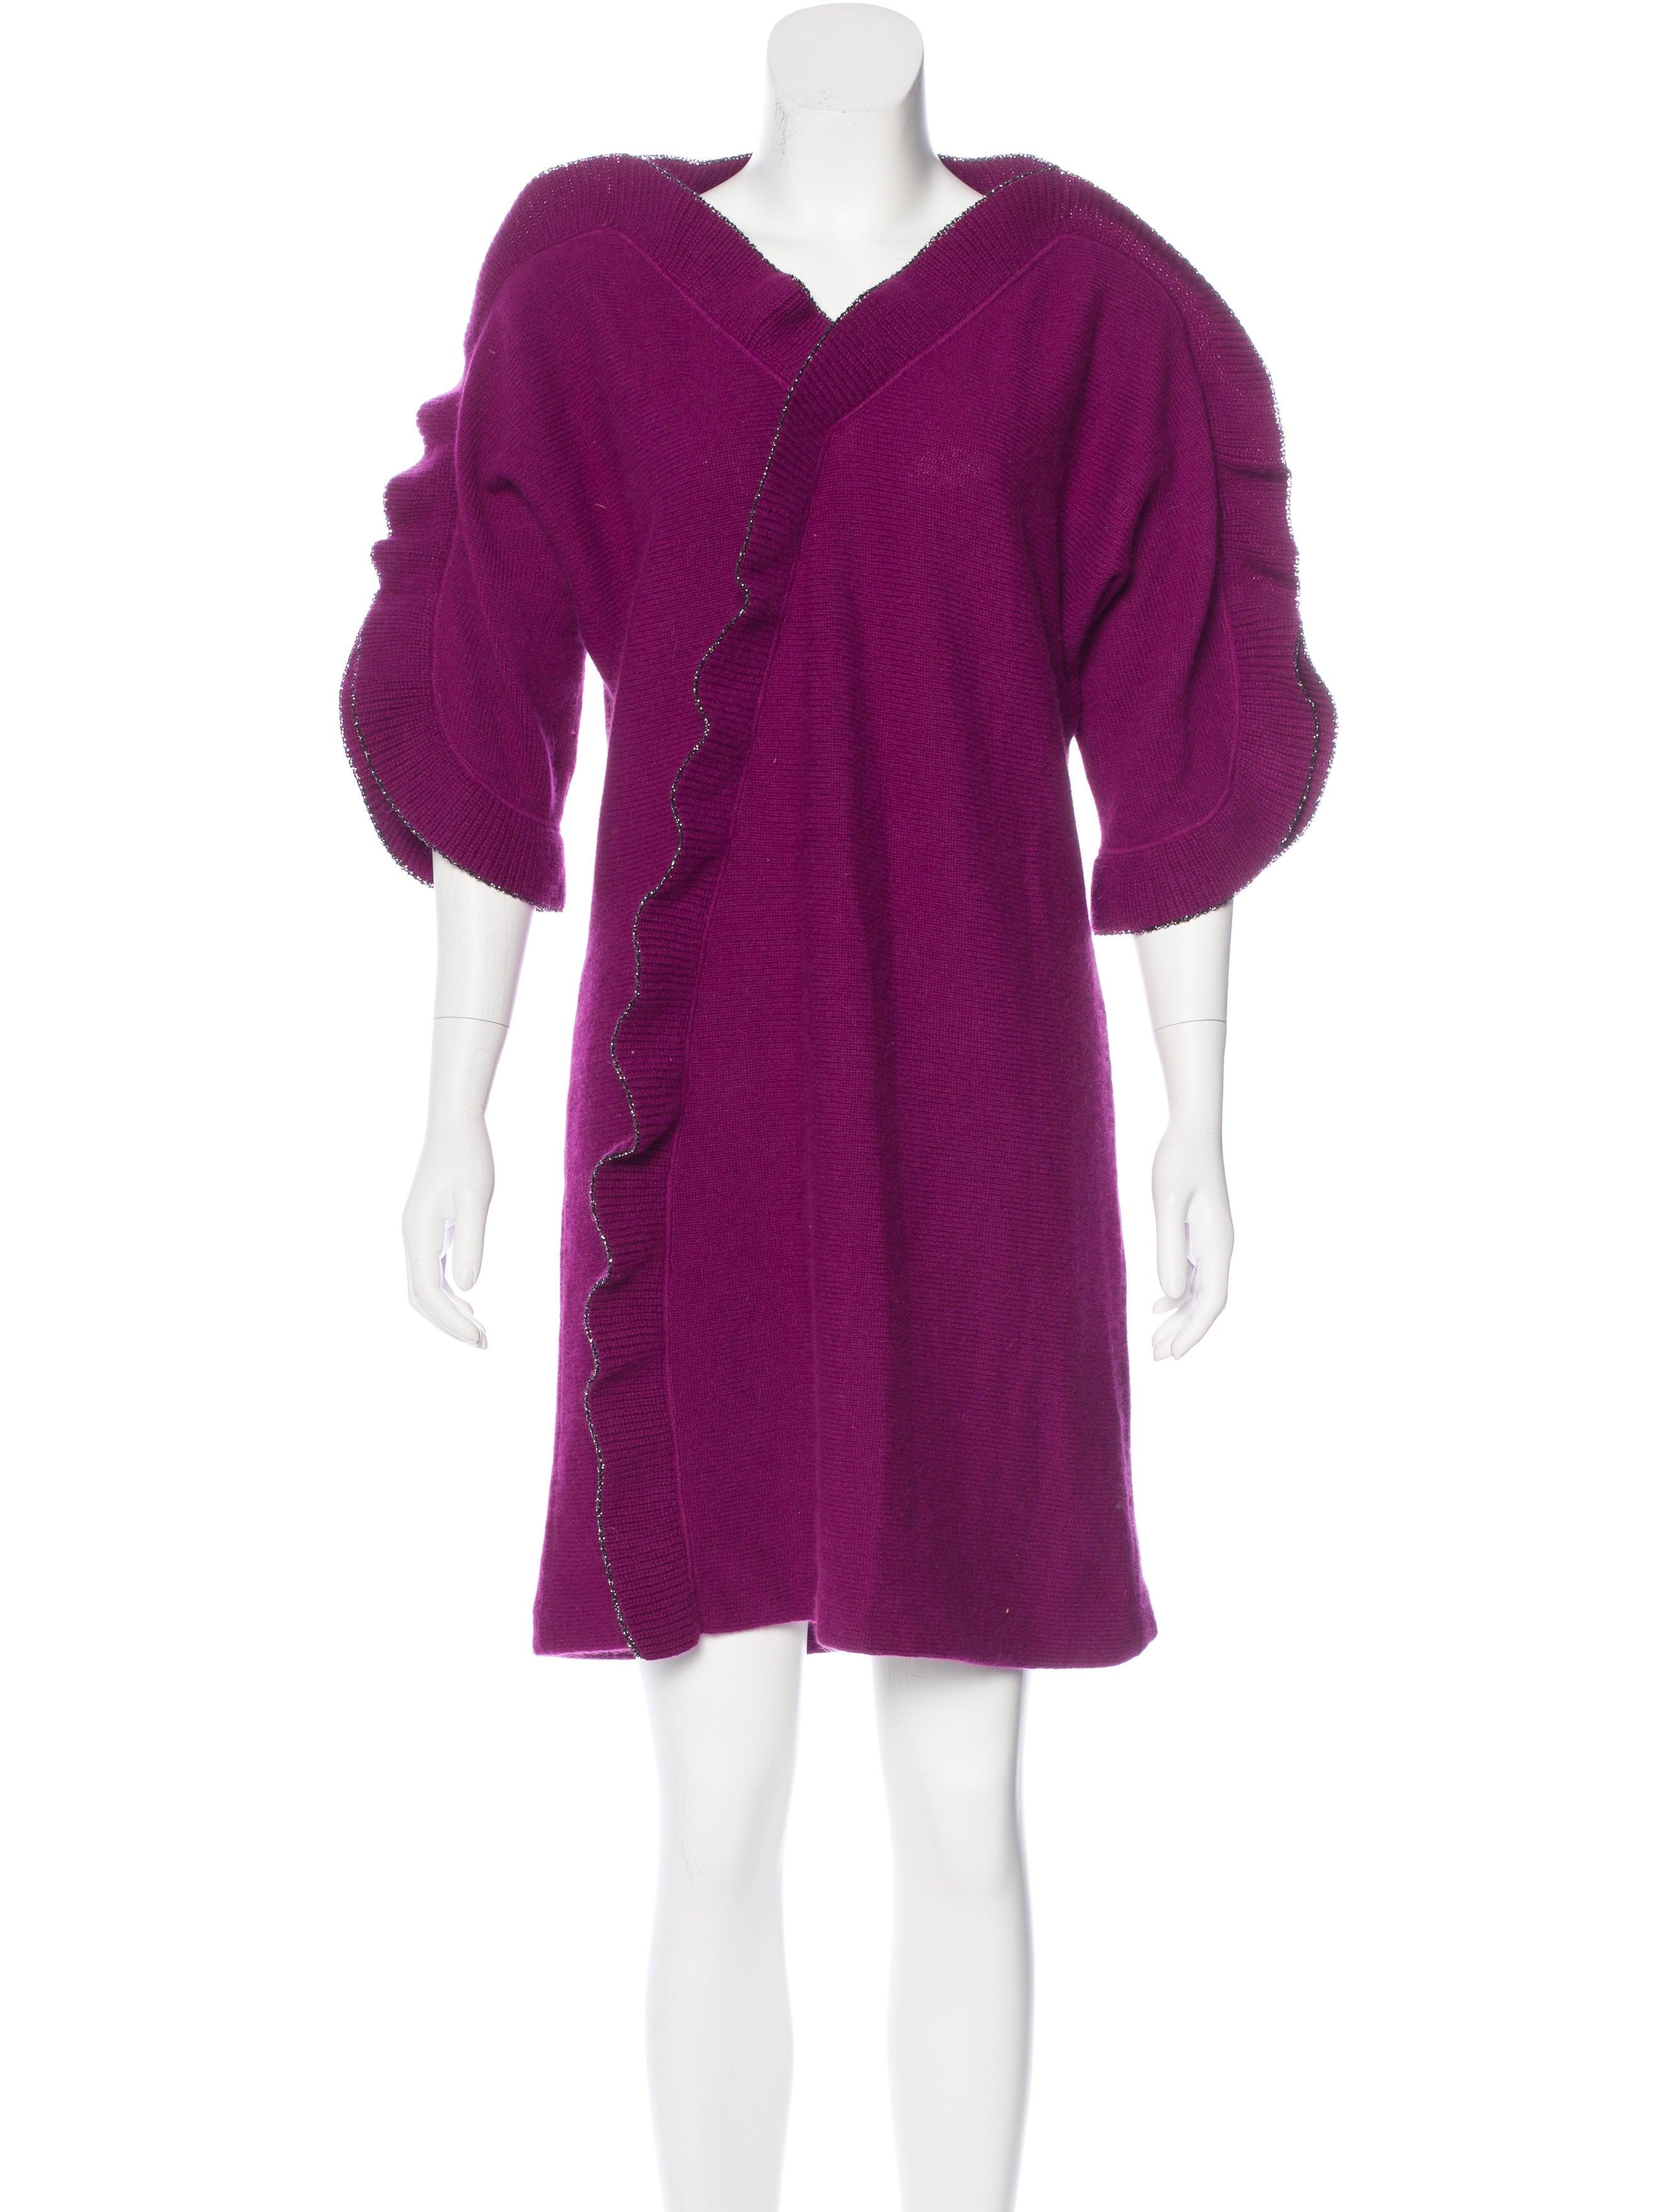 M Missoni Merino Wool Sweater Dress - Clothing - WM439278 | The RealReal